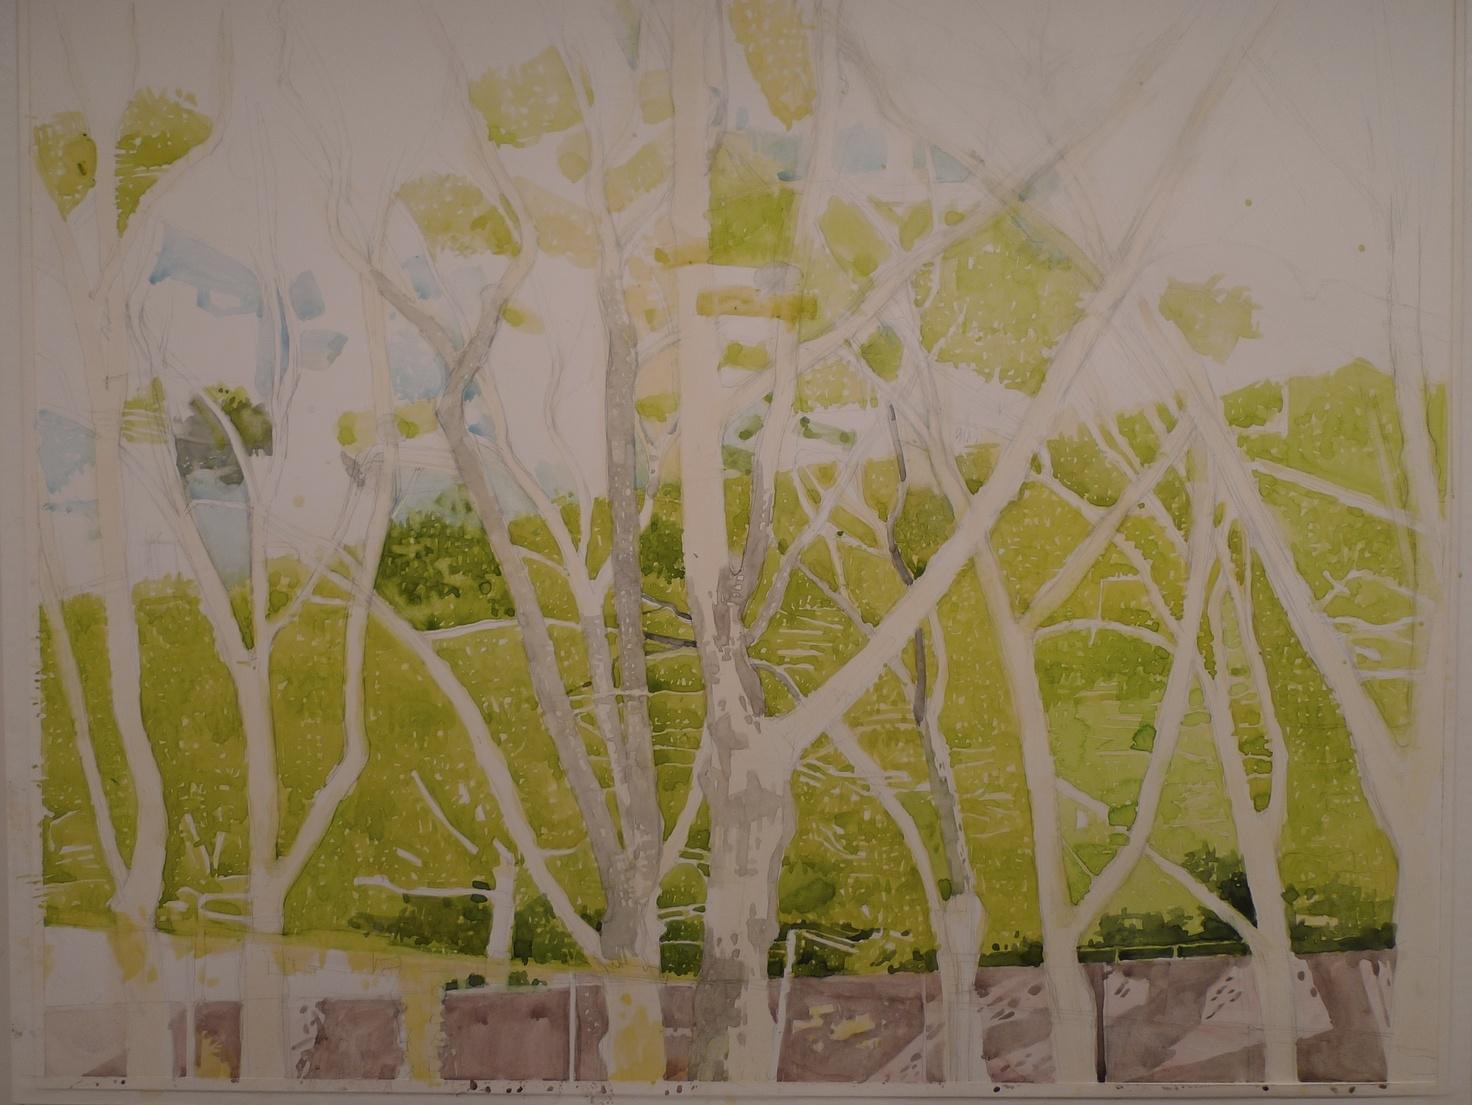 Watercolor on paper 17 x 21 inches Tarek Ashkar,2014